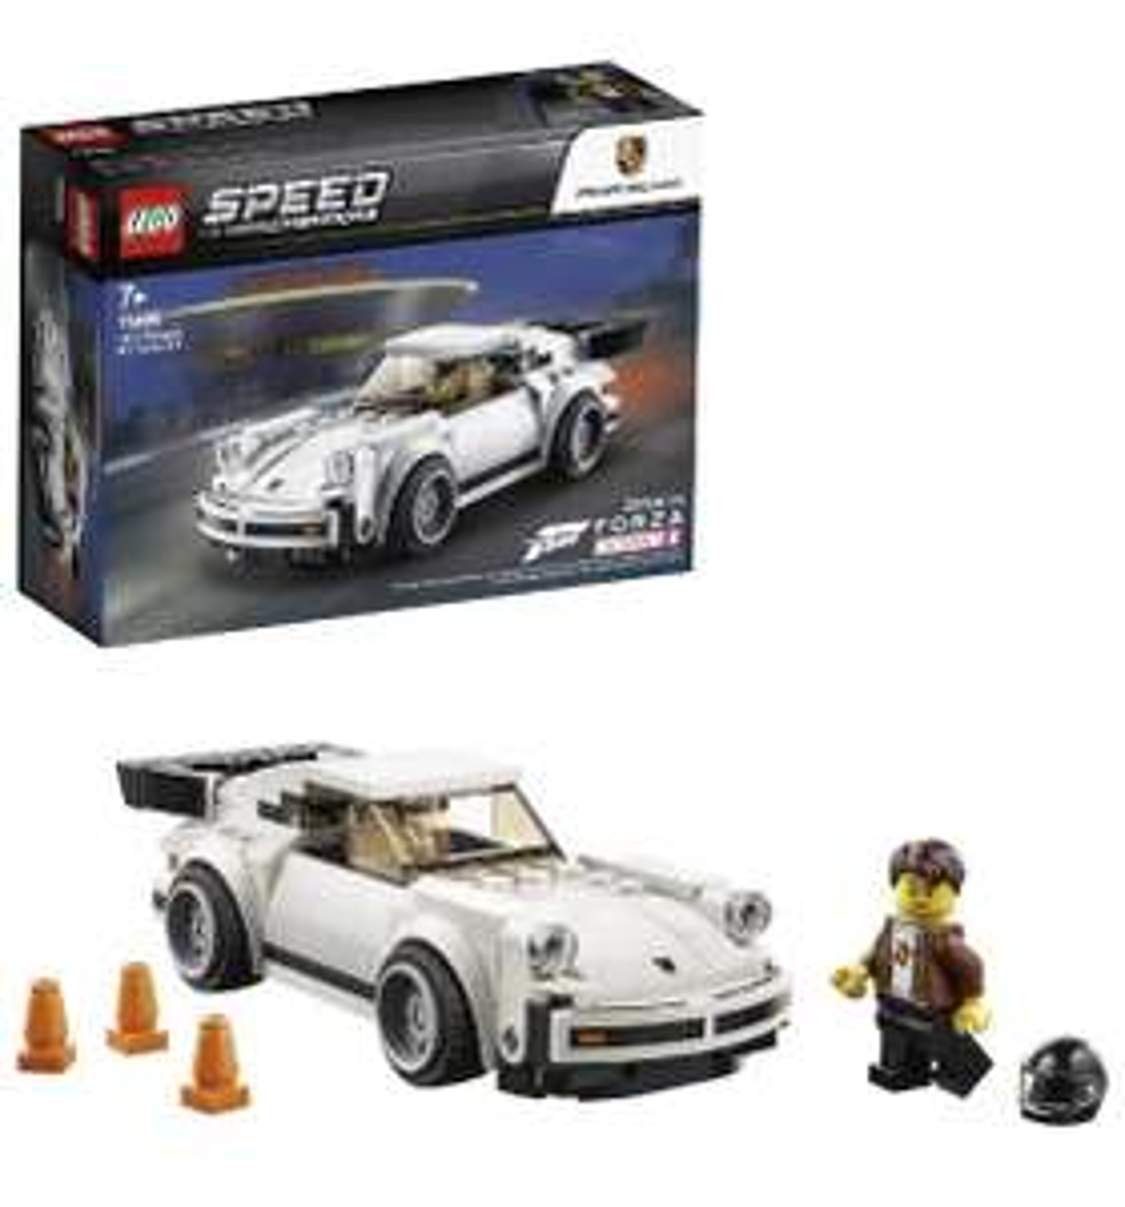 LEGO Speed Champions – 1974 Porsche 911 Turbo 3.0 (Amazon Prime)